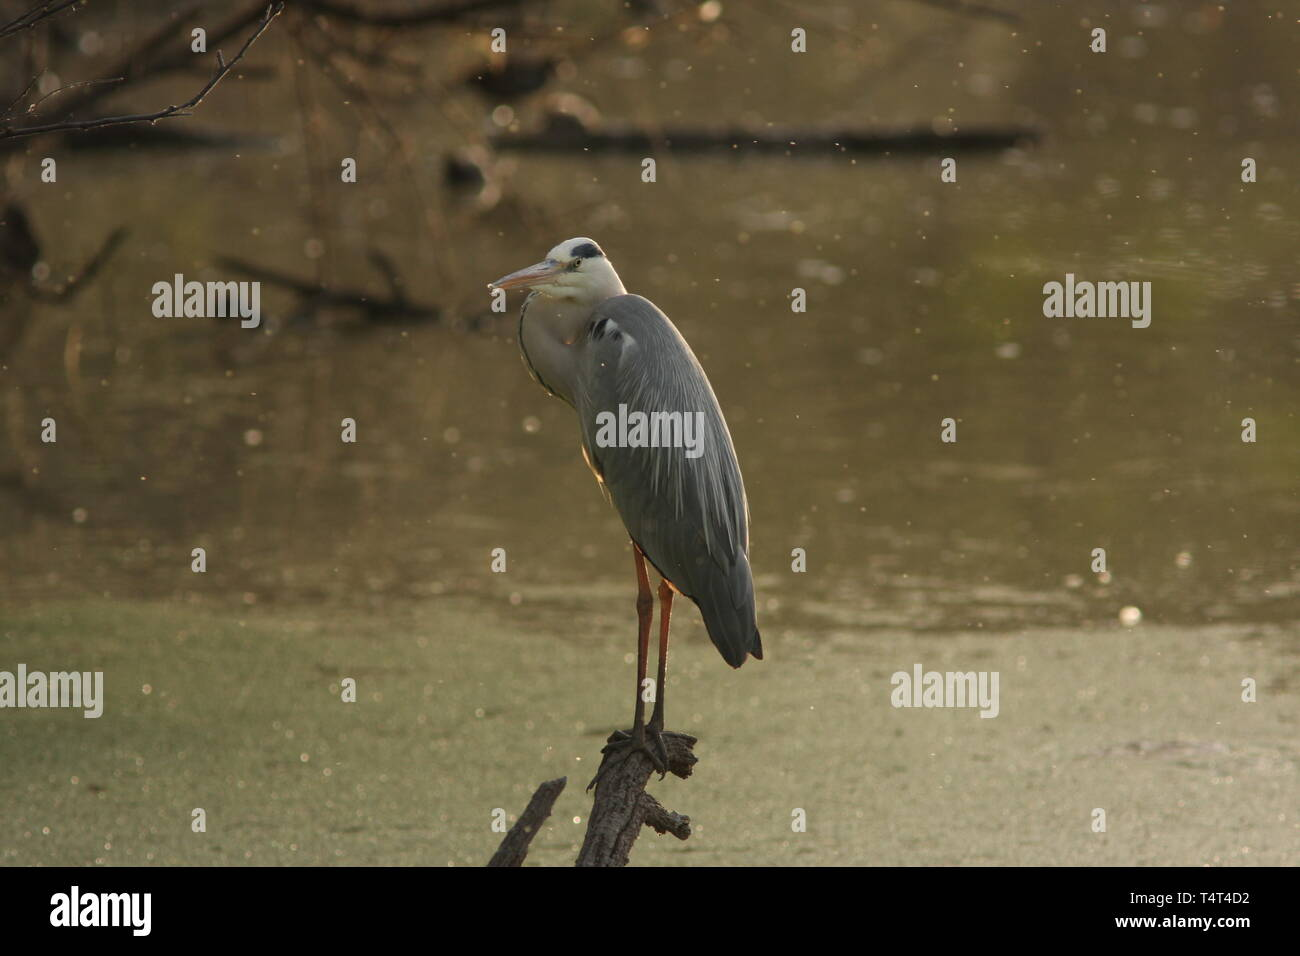 Grey heron, Keoladeo National Park, Rajasthan - Stock Image